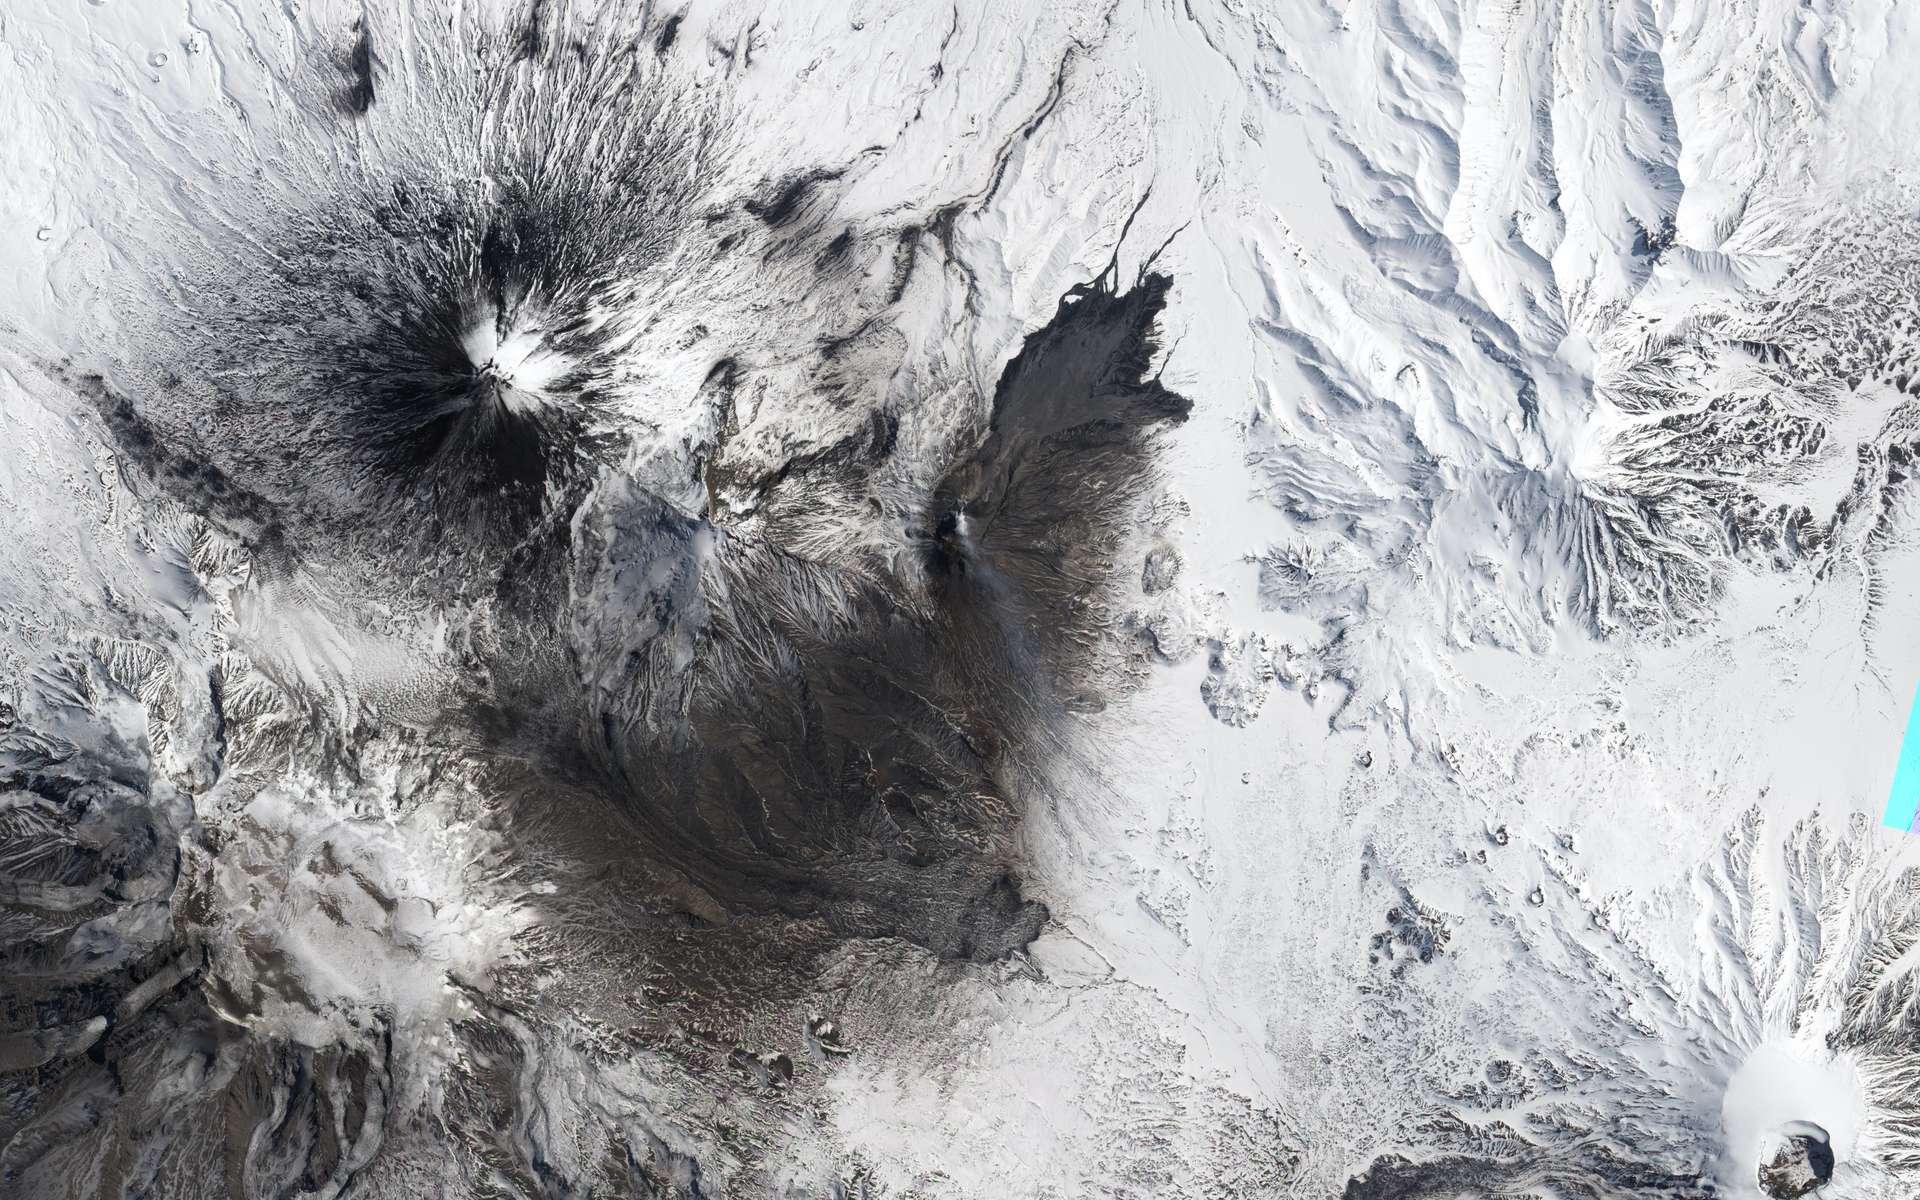 Le volcan Bezymianny, dans la péninsule du Kamchatka. © Nasa Earth Observatory